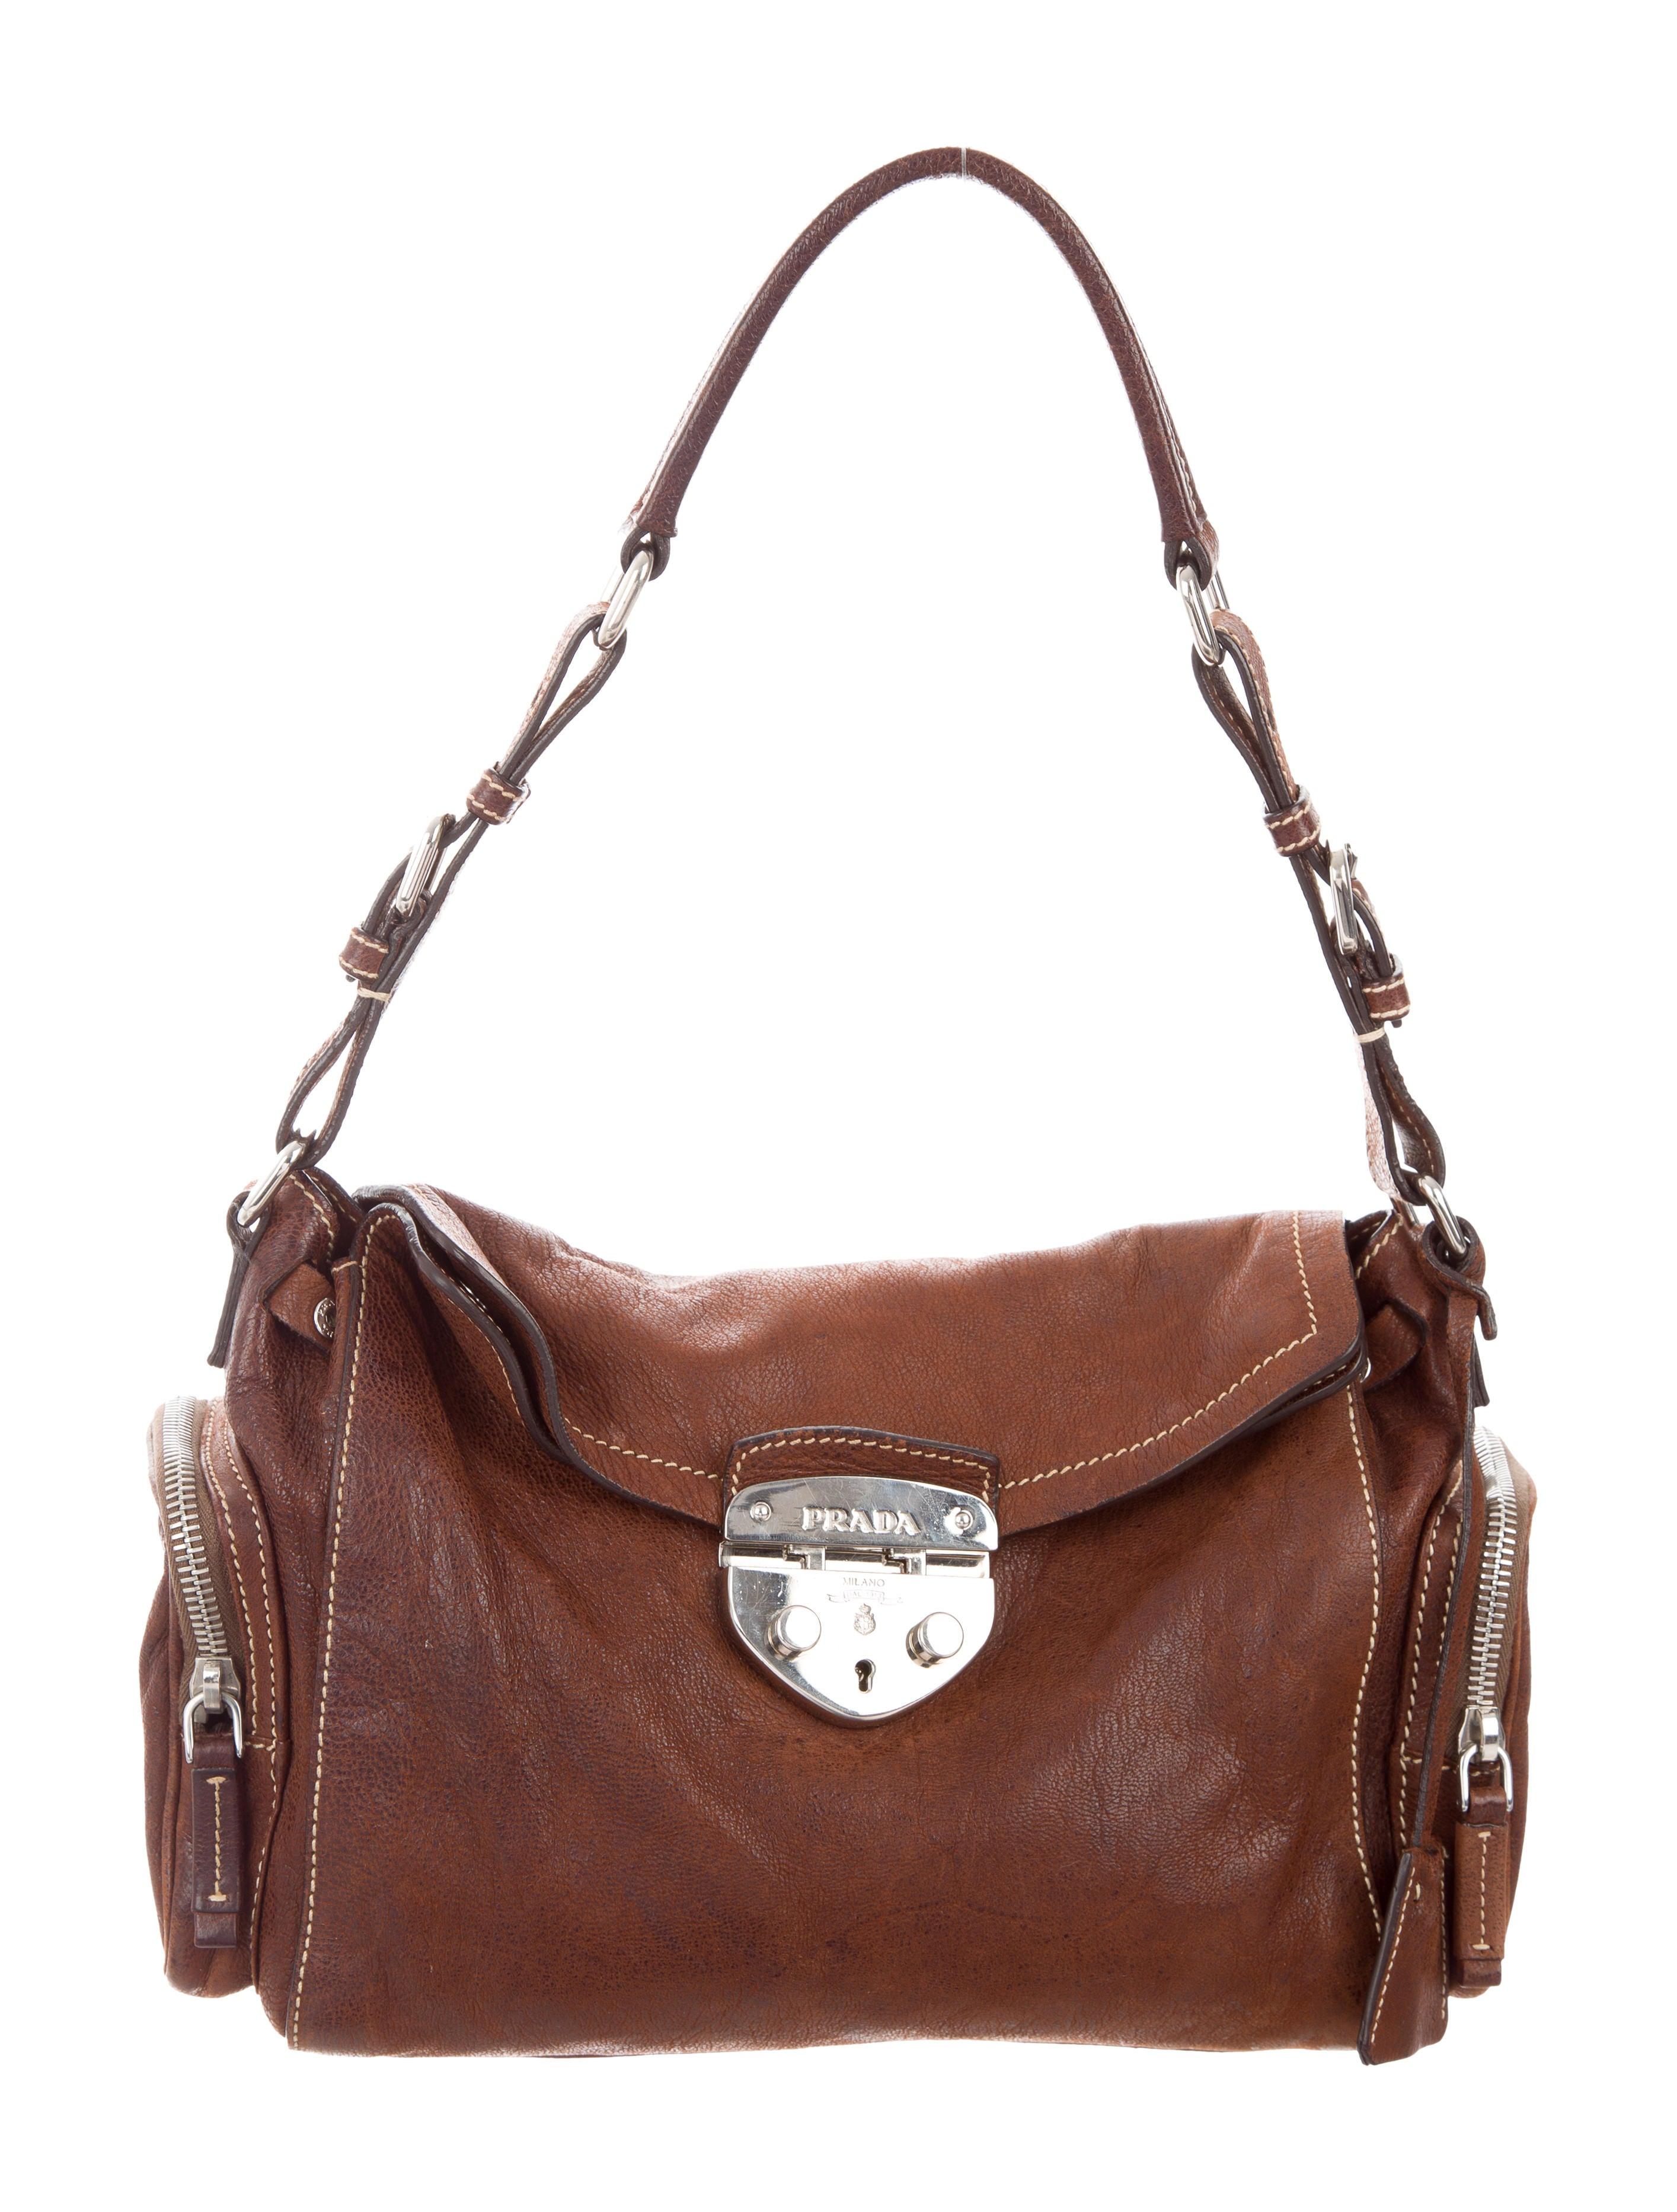 c4a869ab4653 Prada Calf Leather Shoulder Bag Price | Stanford Center for ...